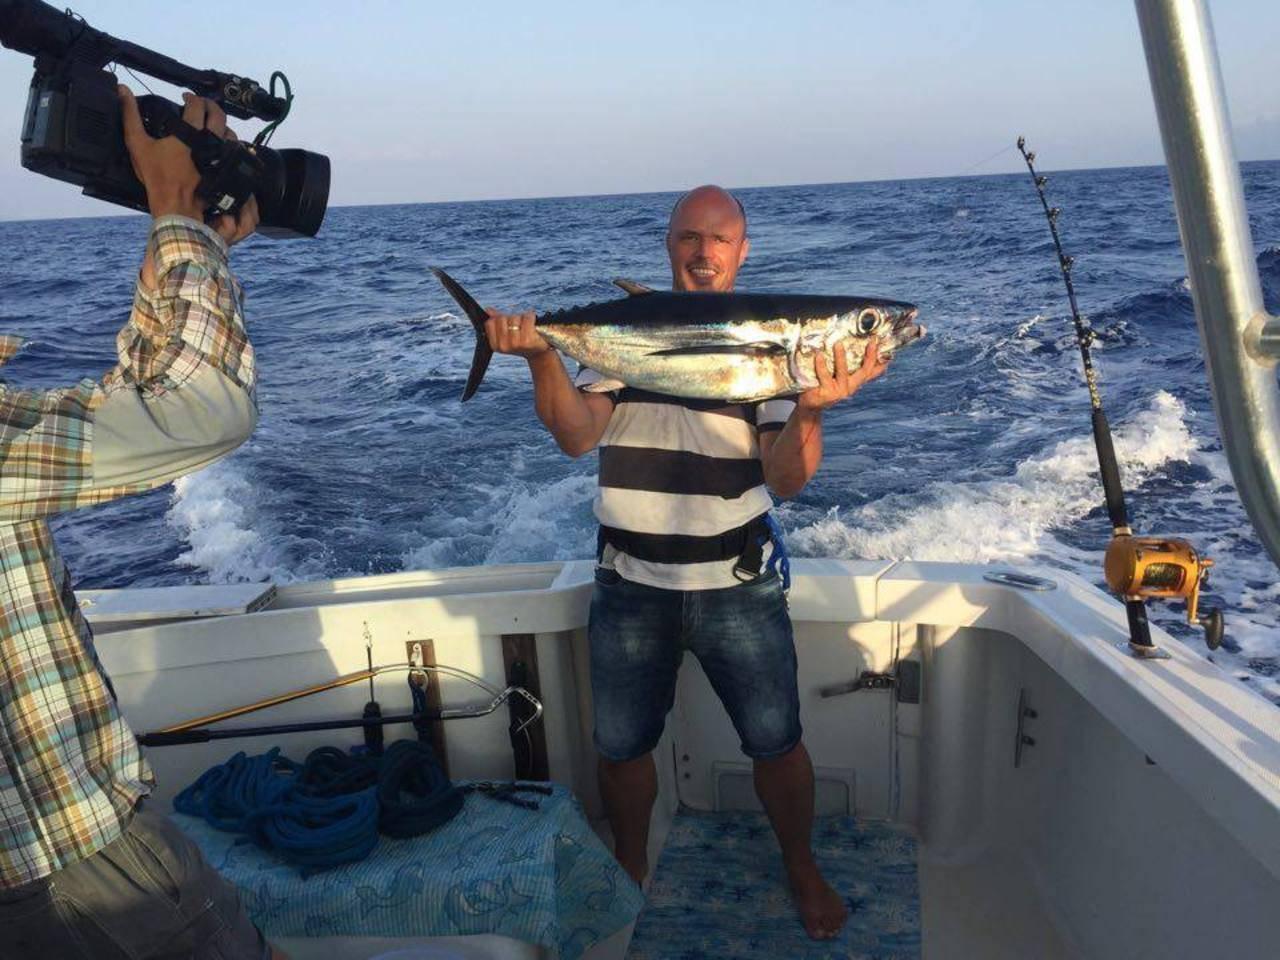 Monster Fish Alanya fishing trip photo 3260675